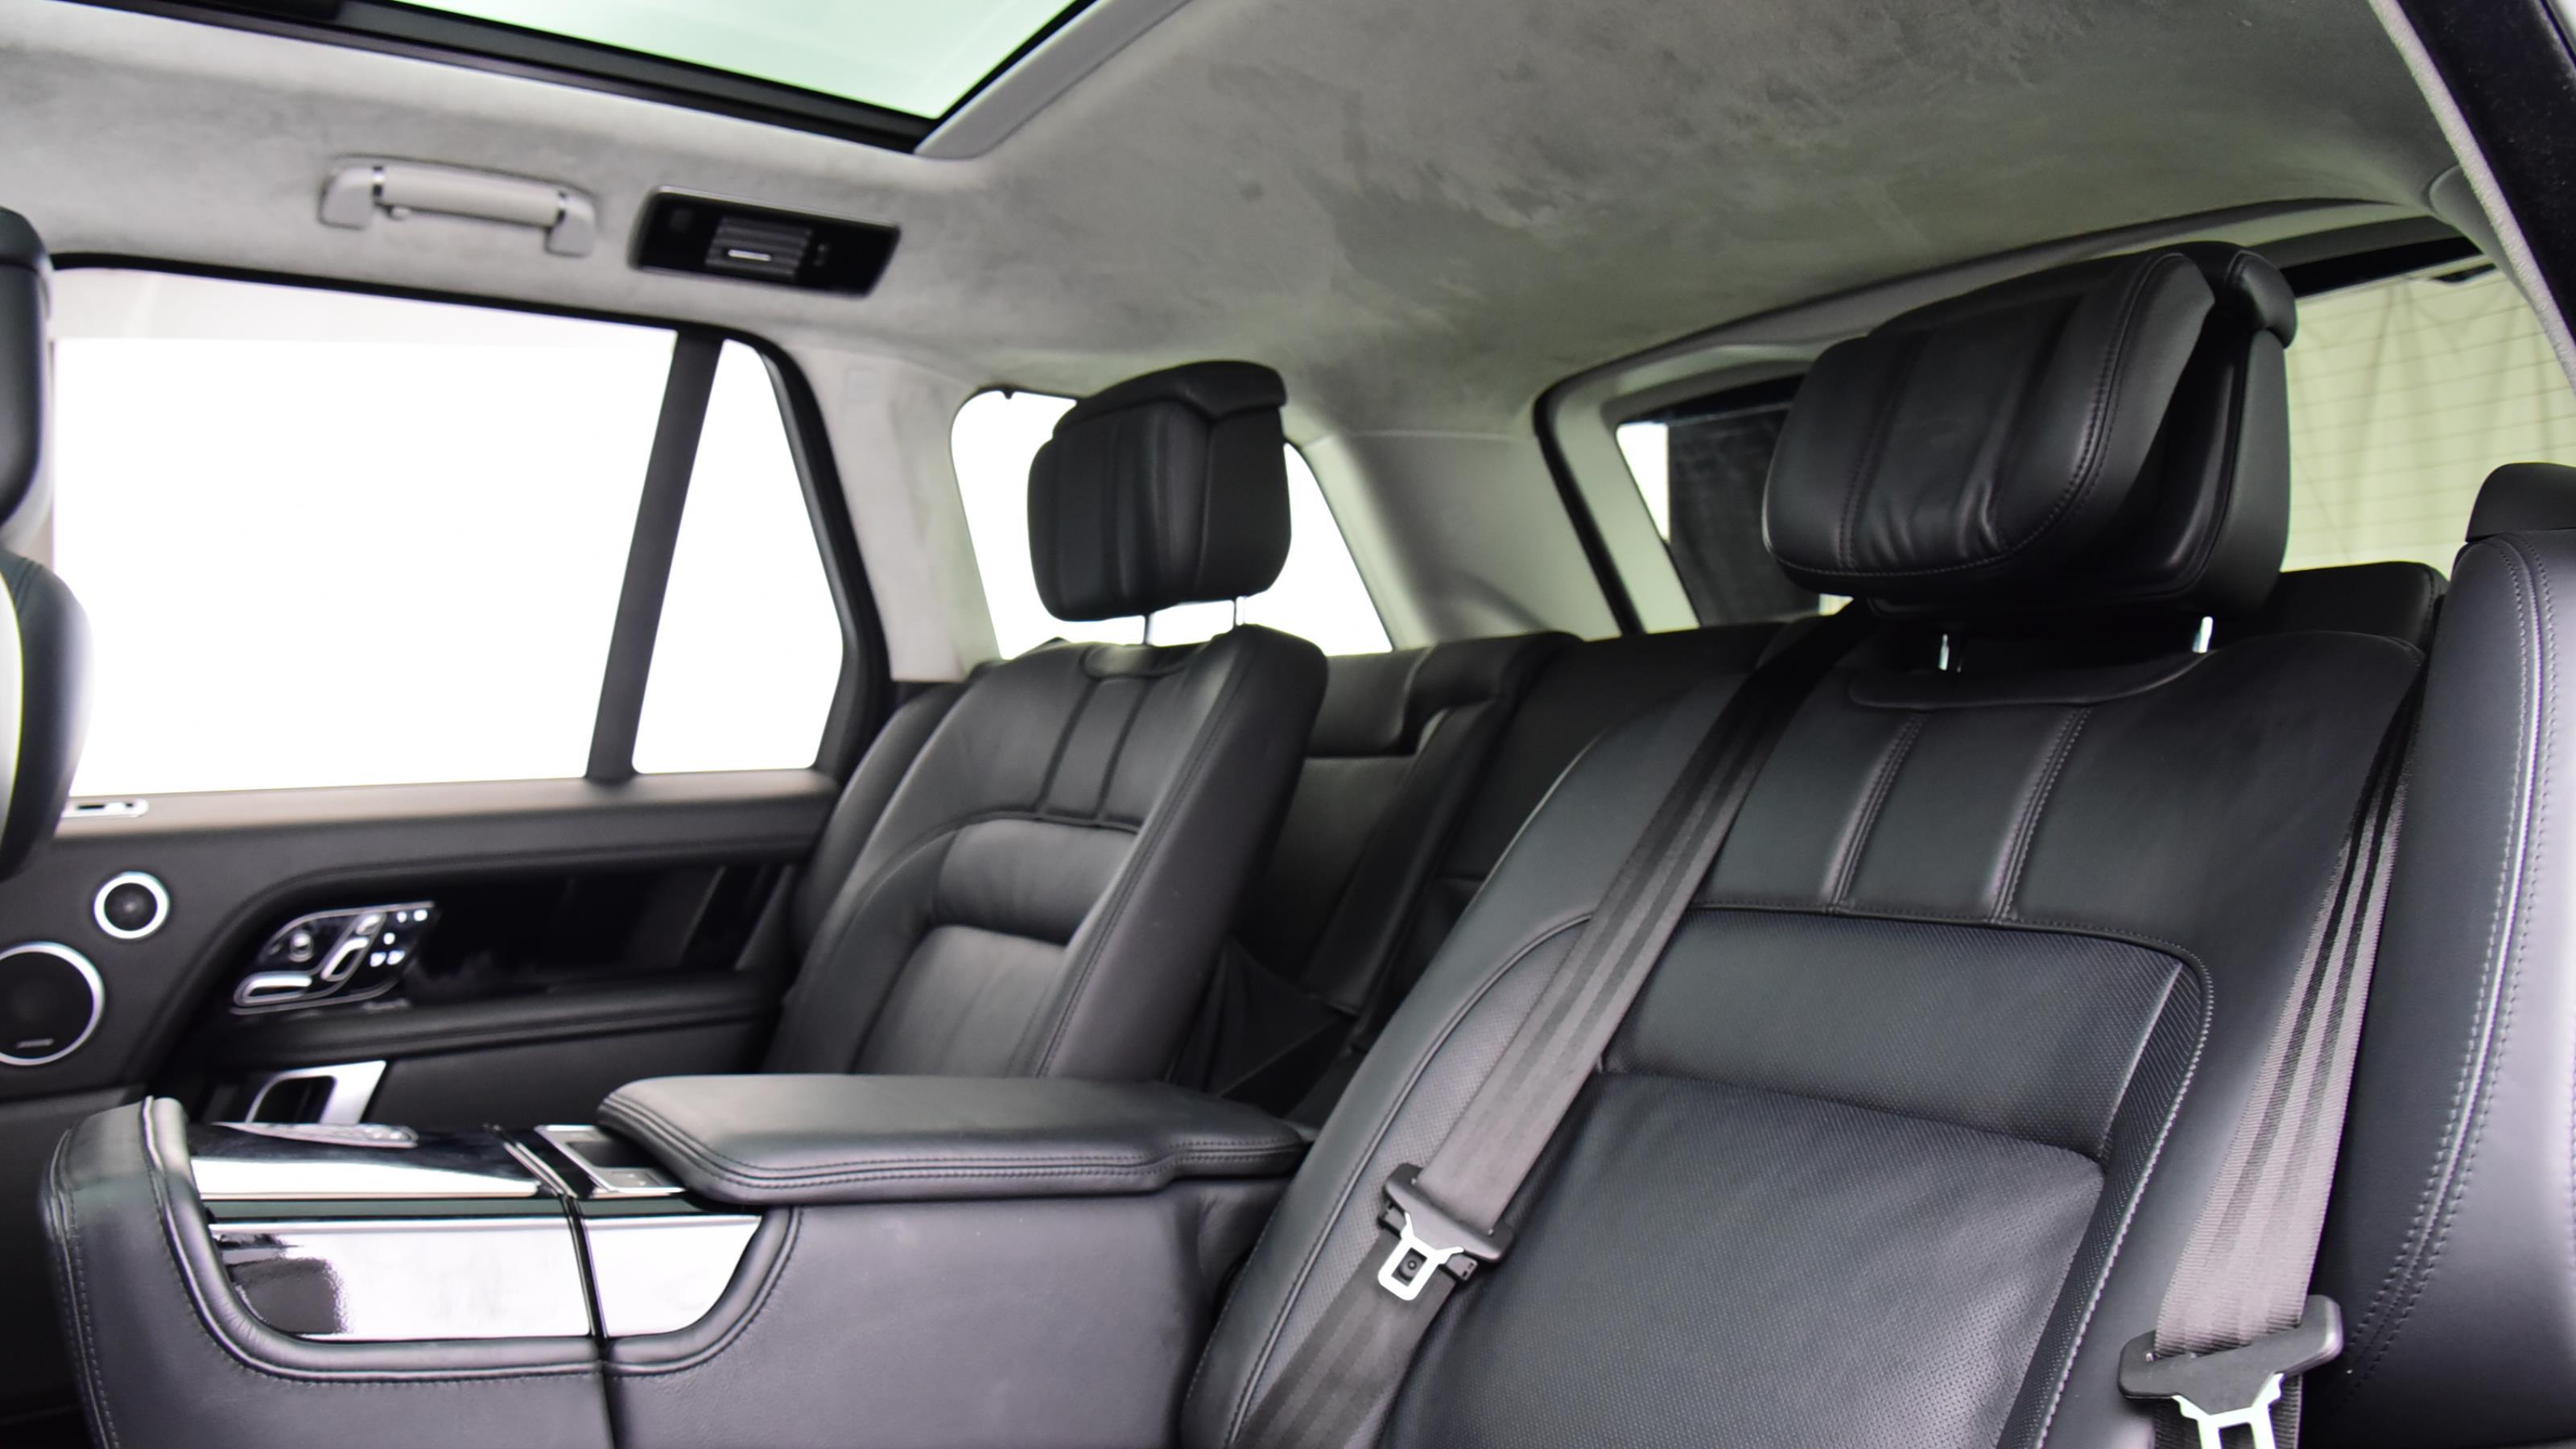 Used 2019 Land Rover RANGE ROVER 3.0 SDV6 Autobiography 4dr Auto BLACK at Saxton4x4